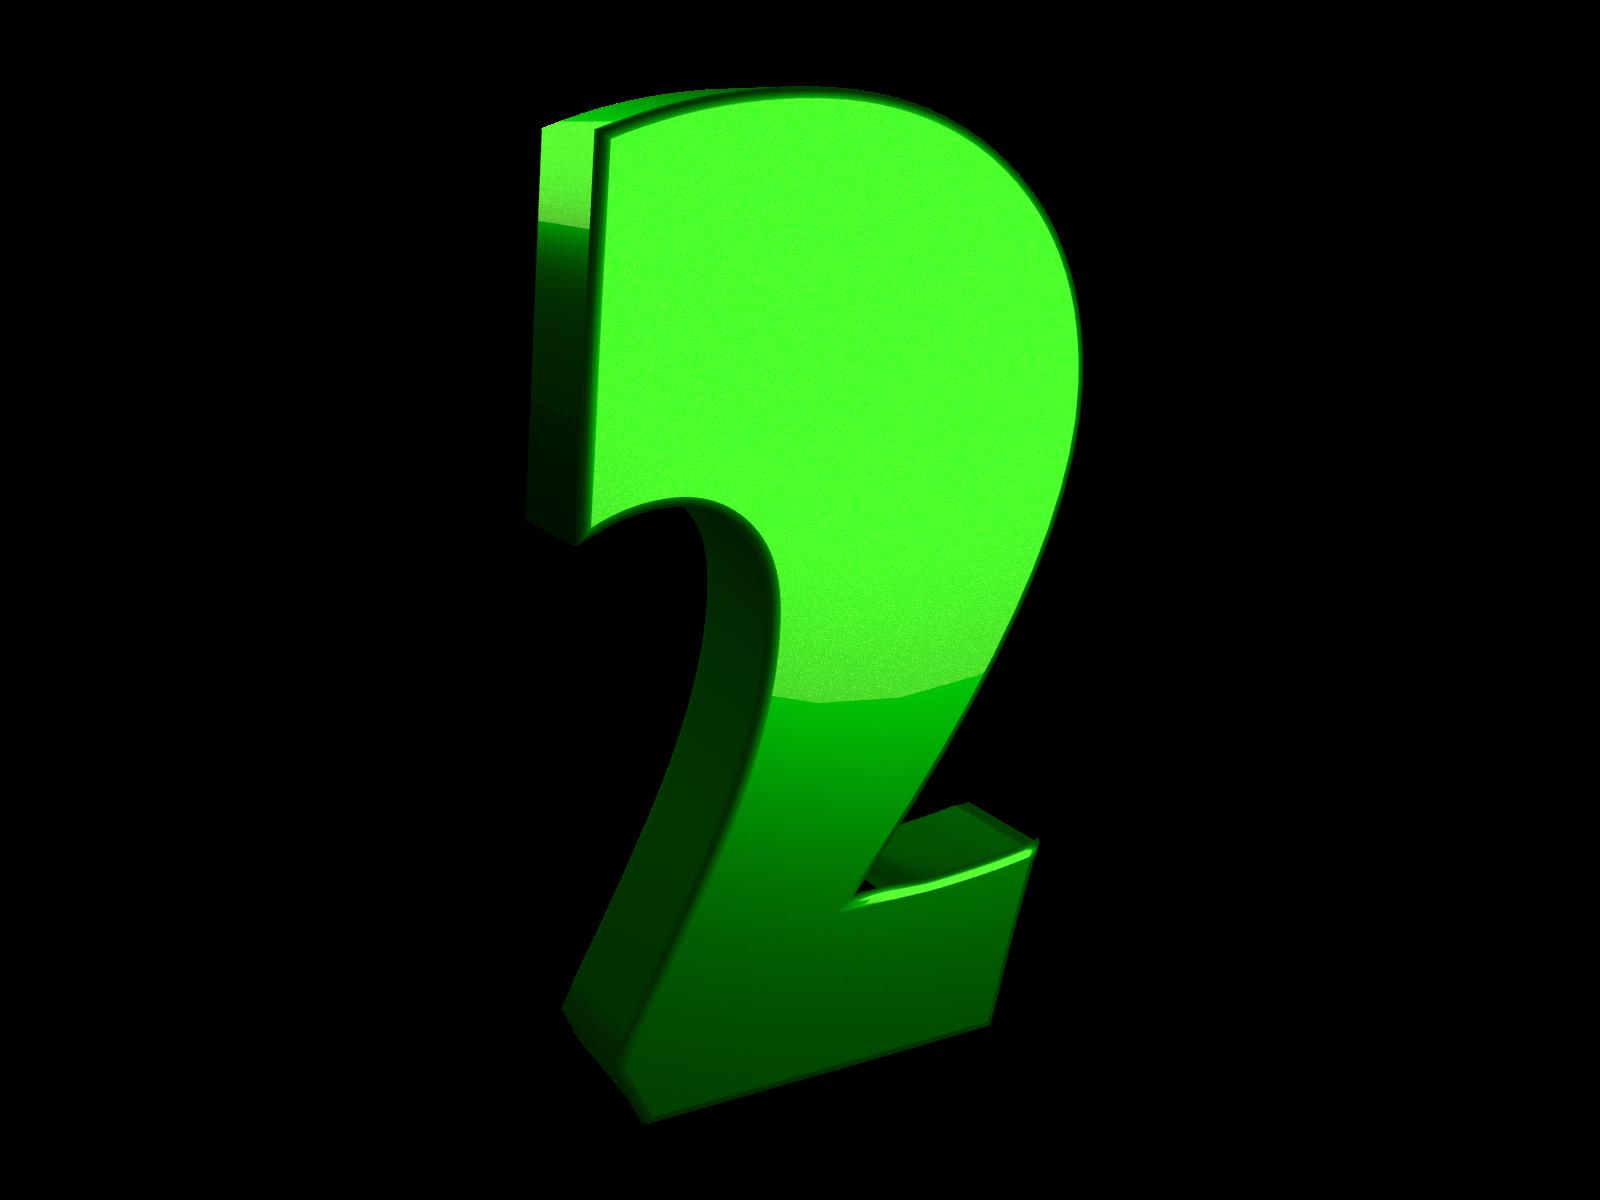 Number 6 Clipart 6 3d Png  Number 6 6 3d Png Transparent